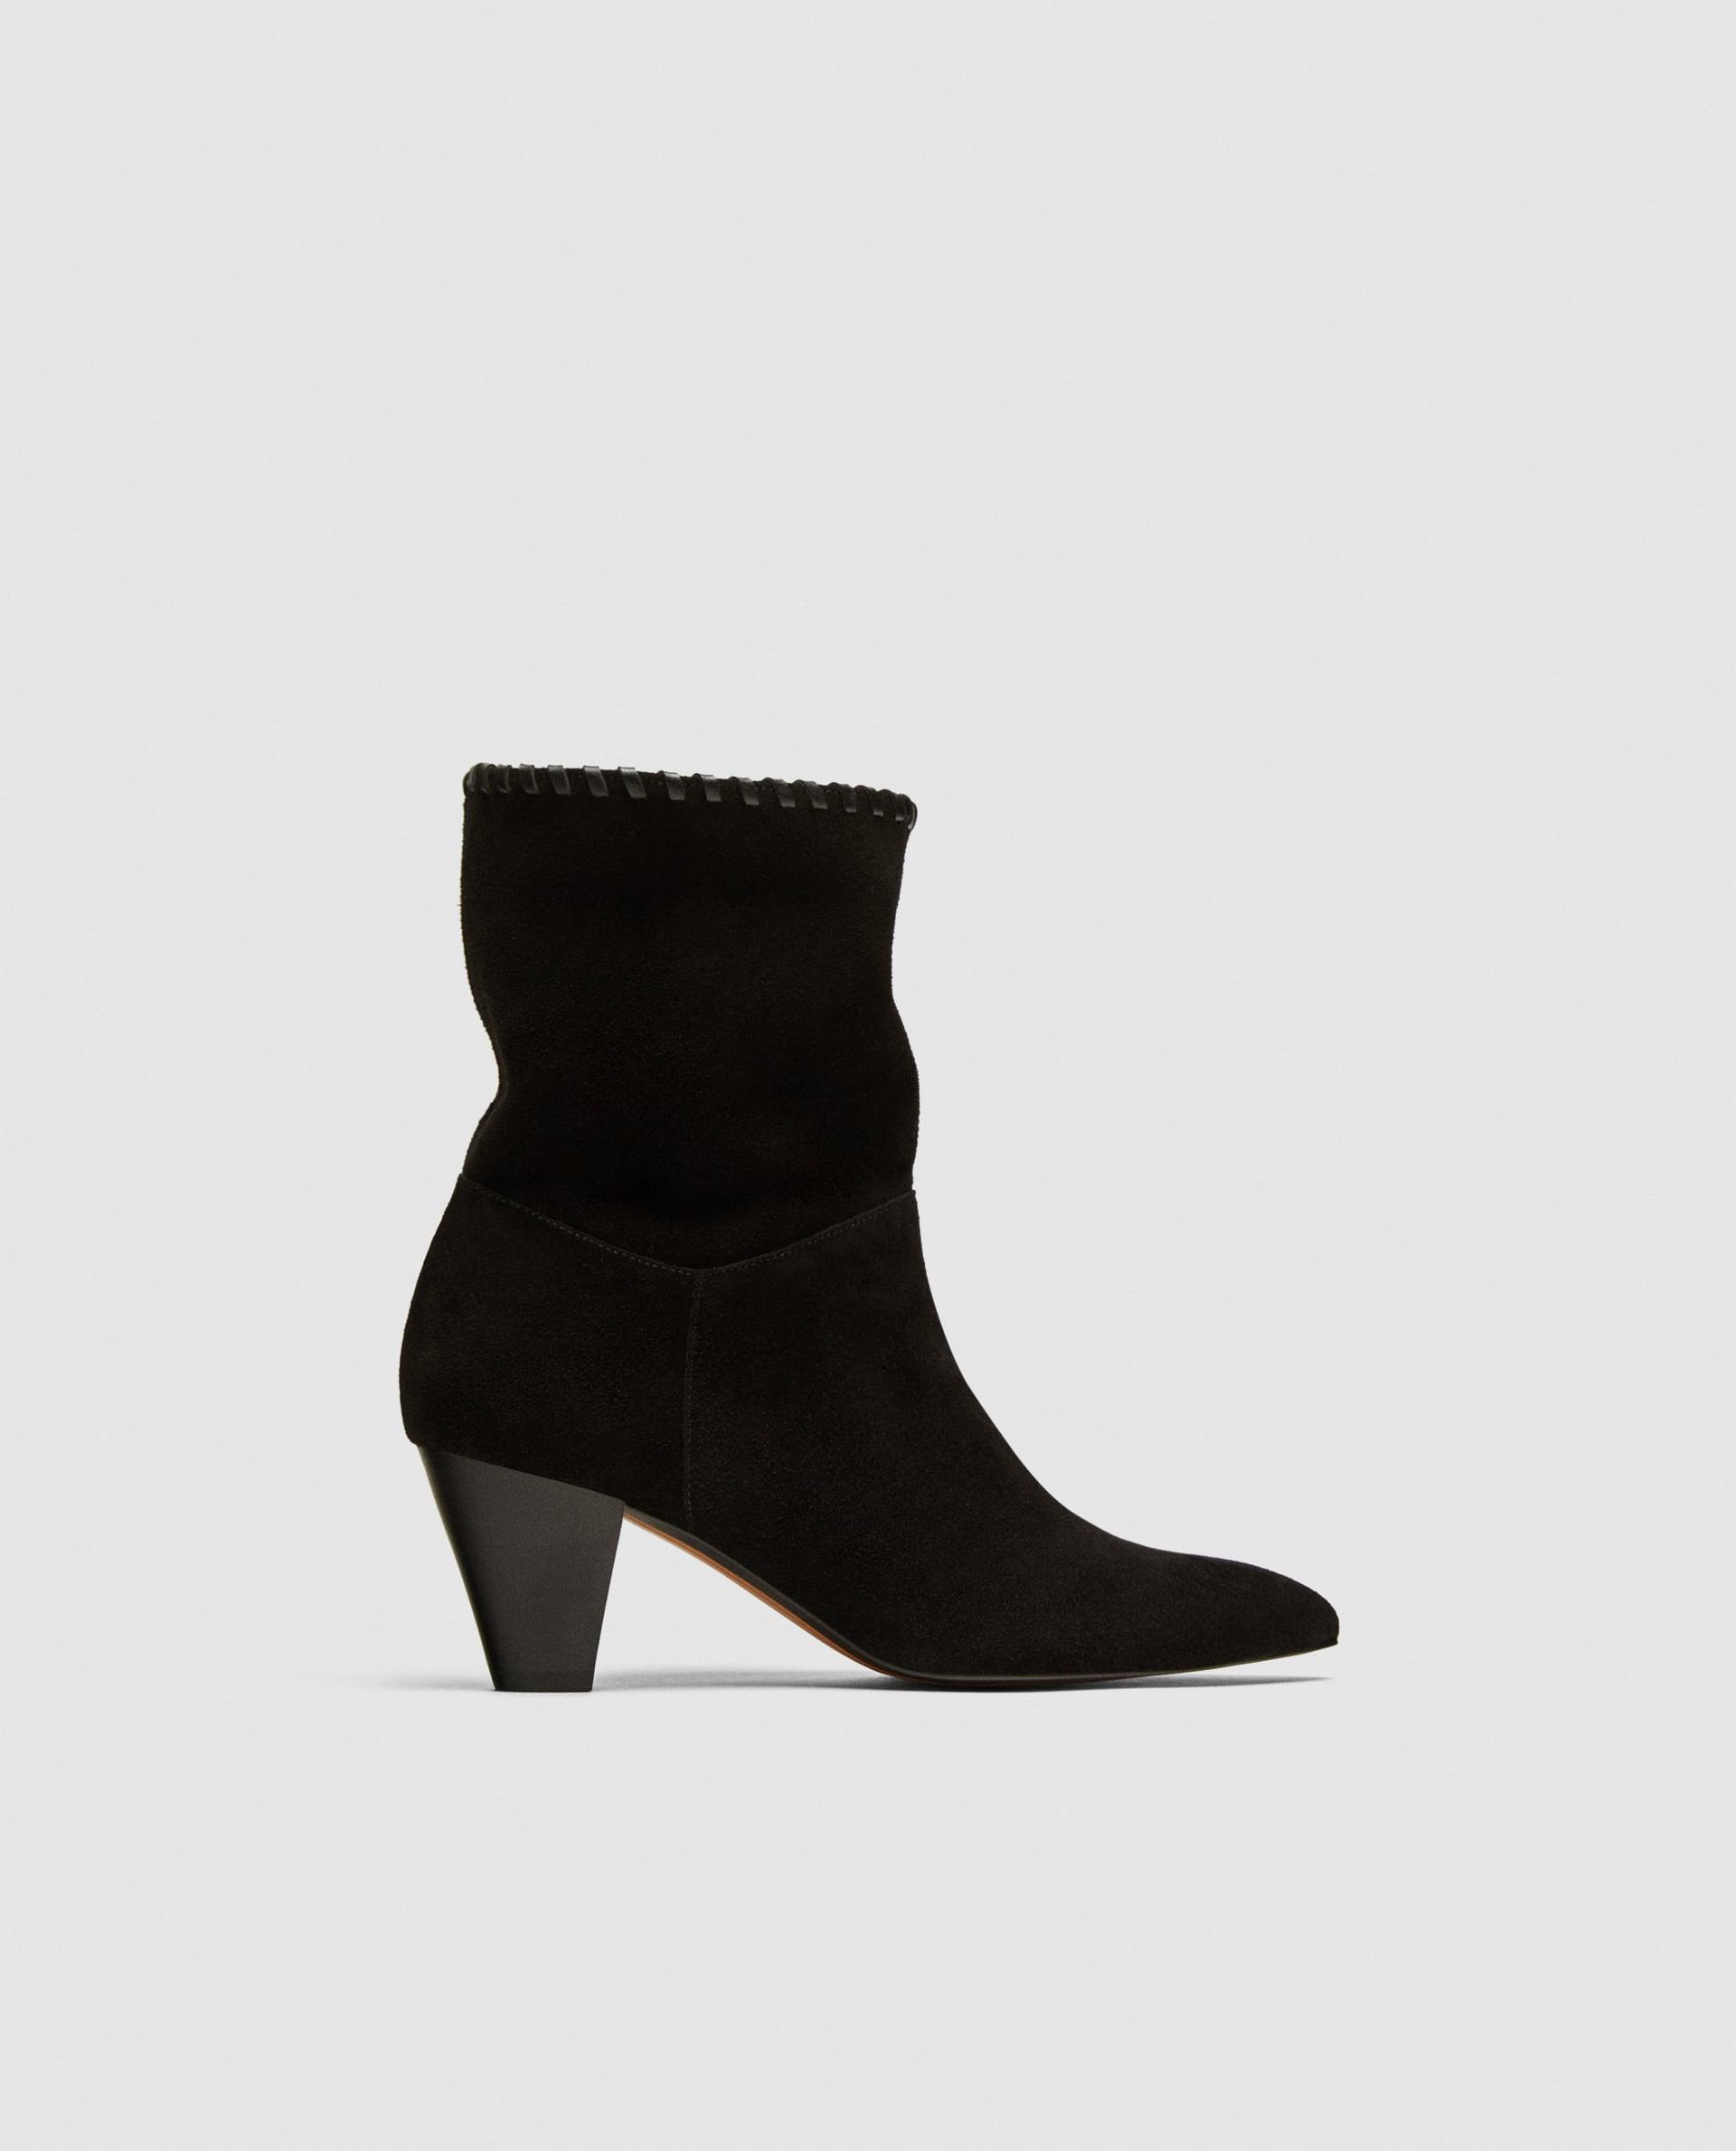 https://www.zara.com/ca/en/leather-high-heel-ankle-boots-p11107301.html?v1=5323306&v2=969009